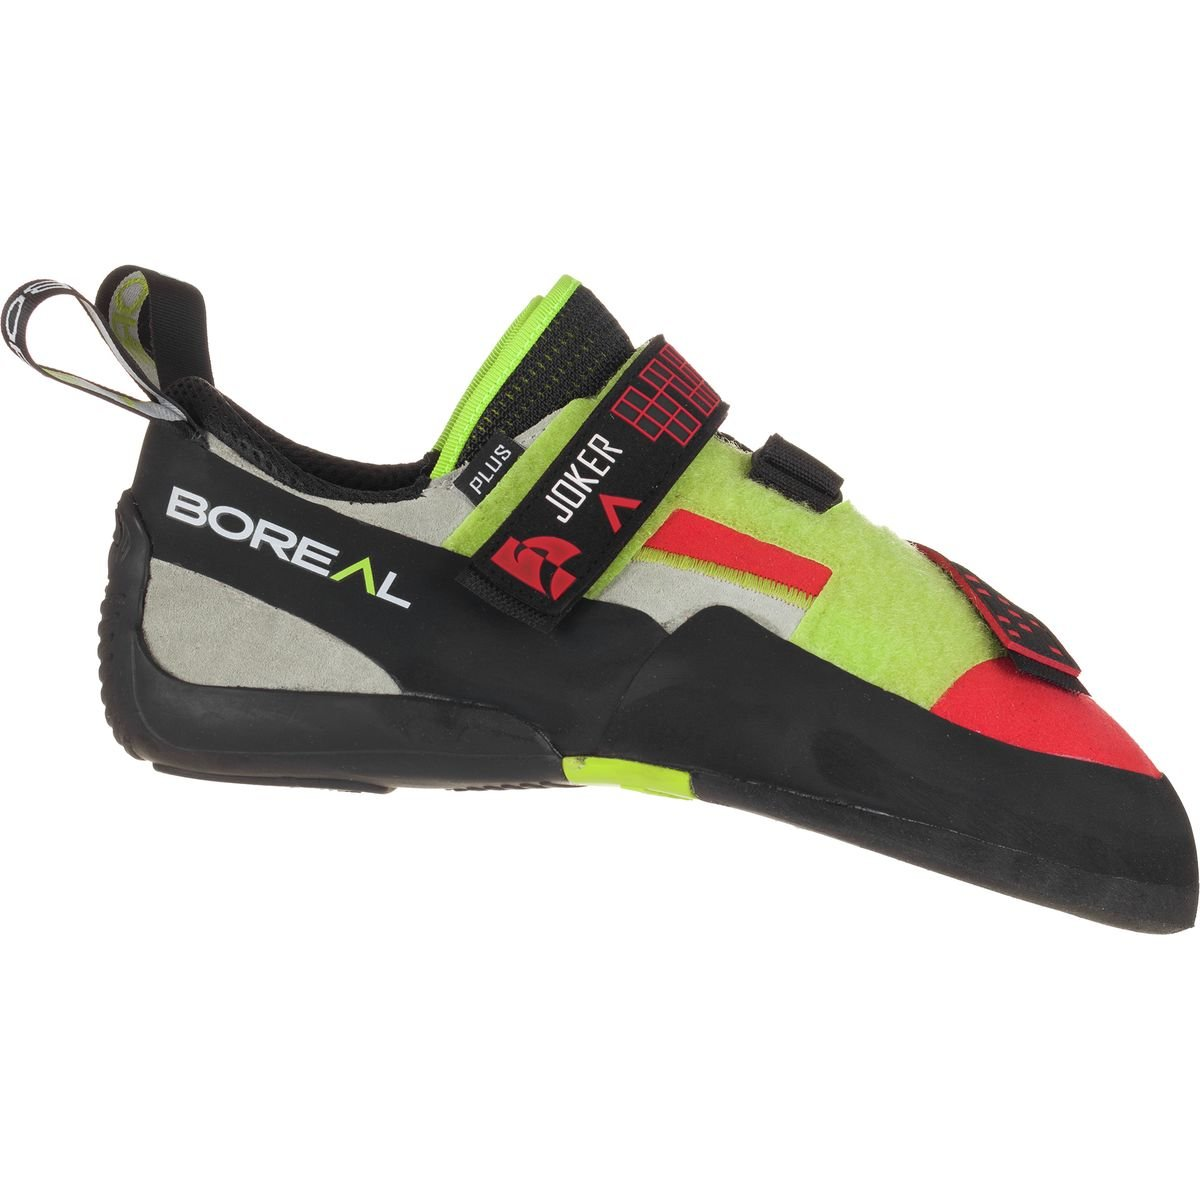 Boreal Joker Plus Climbing Shoe One Color, US 11.5/UK 10.5 by Boreal